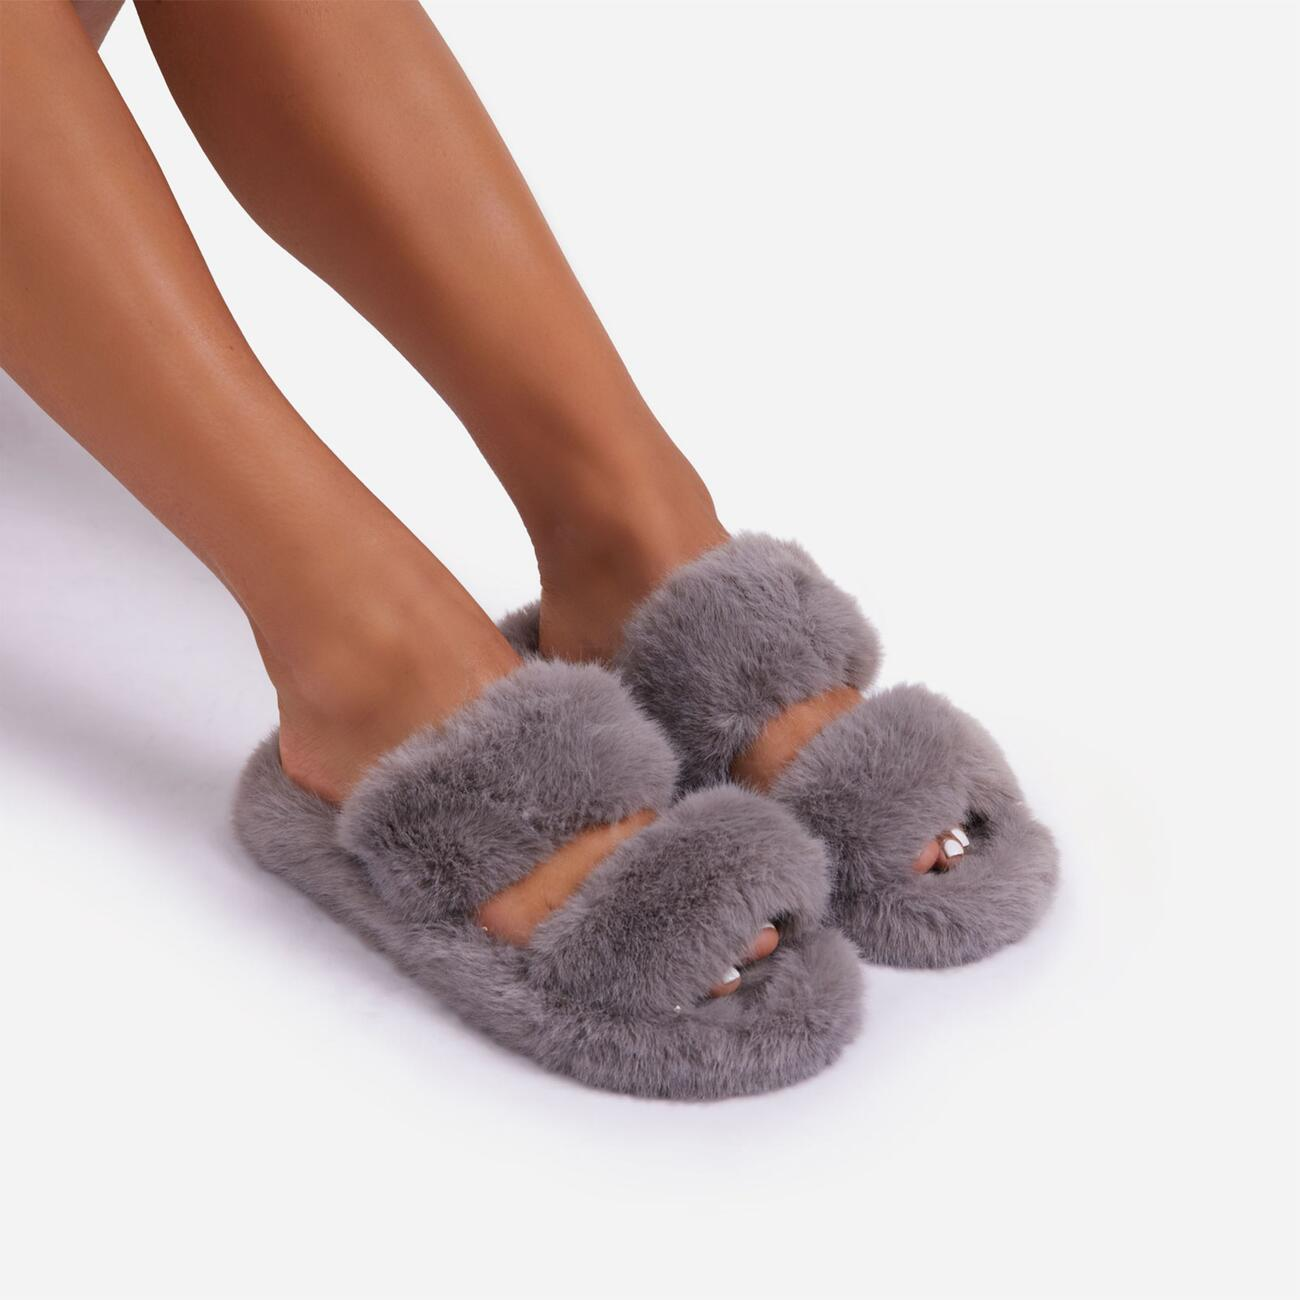 Pamper Fluffy Double Strap Slider Slipper In Grey Faux Fur Image 2